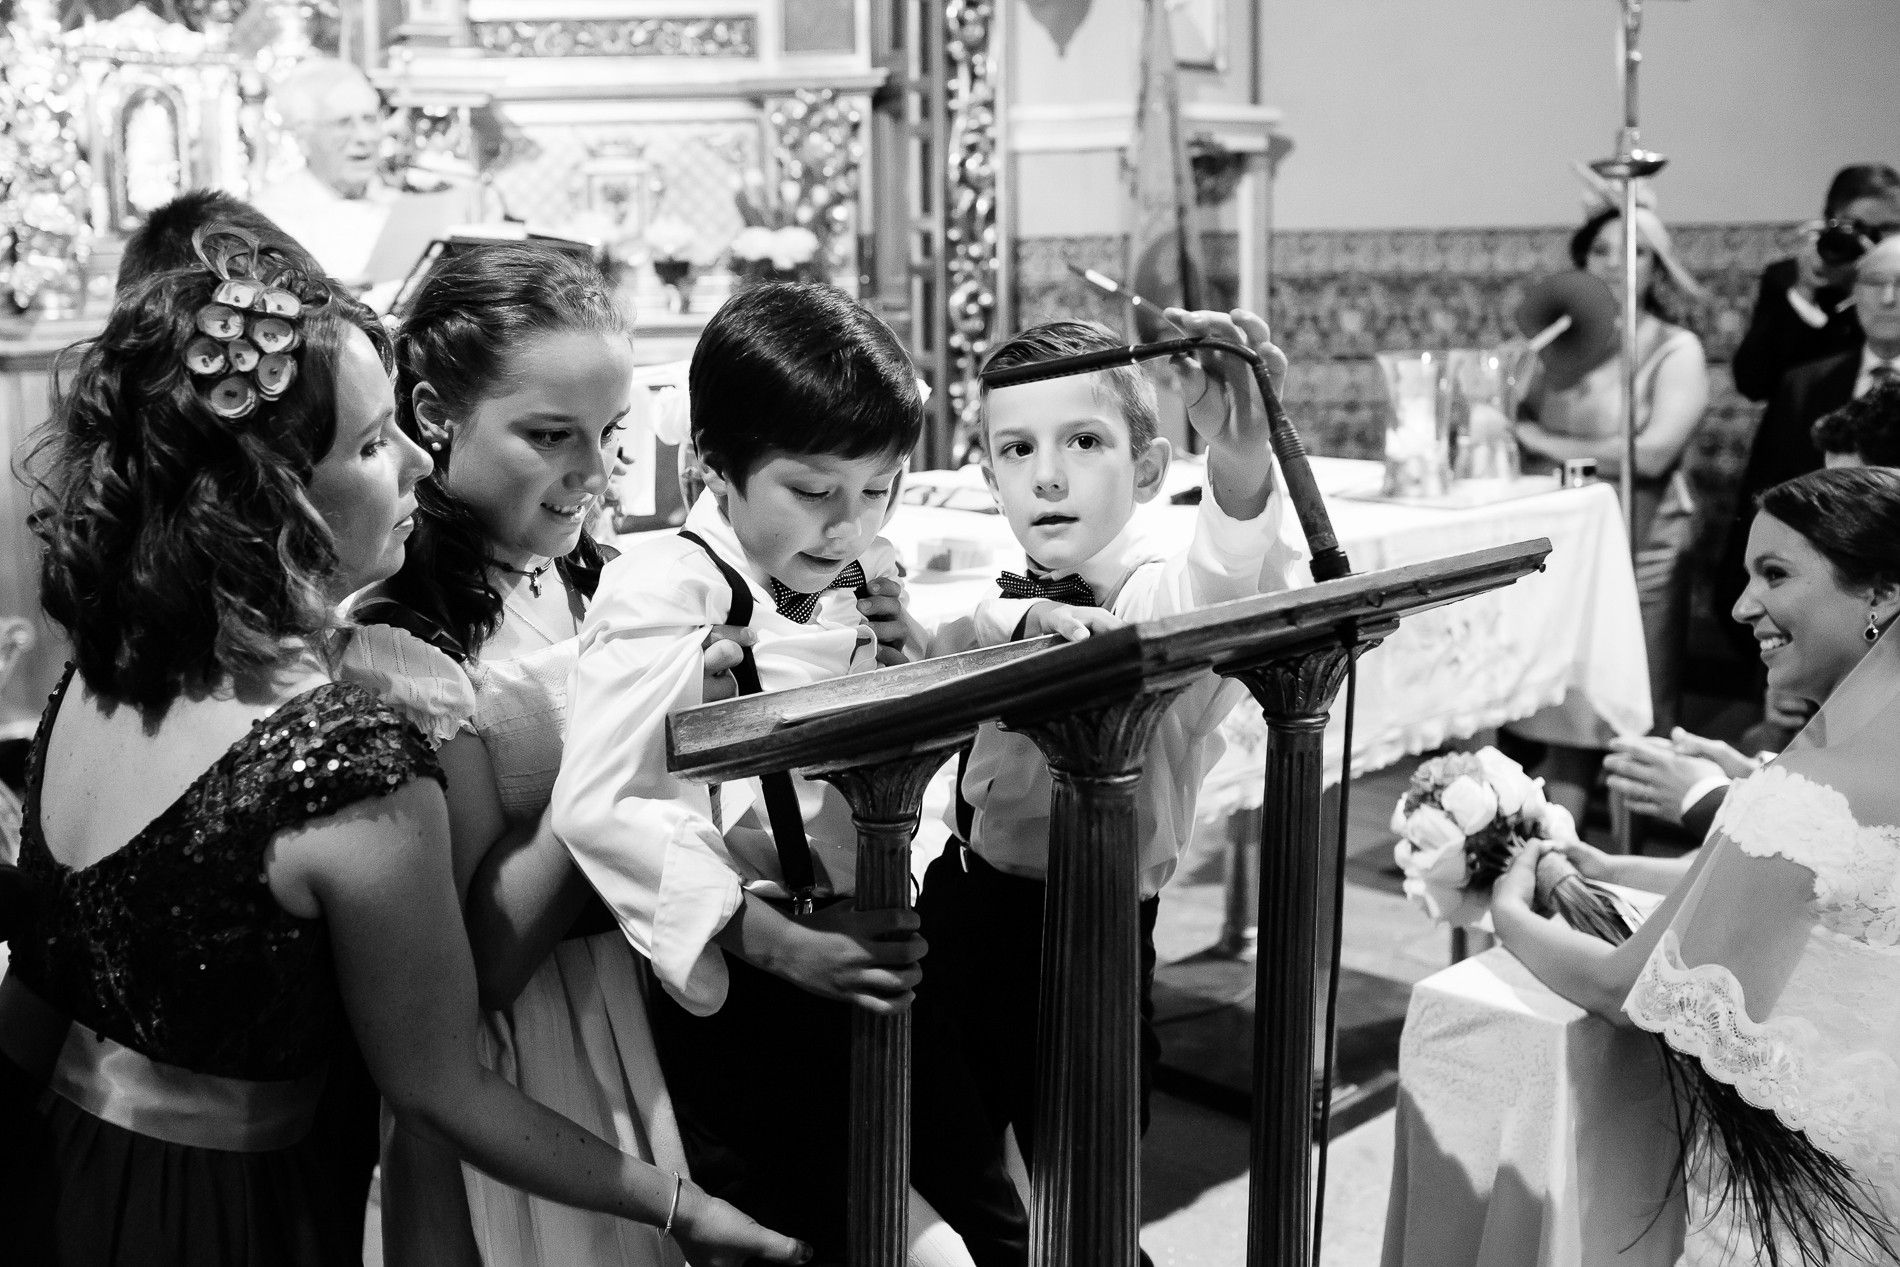 fotografo-de-boda-plasencia-20